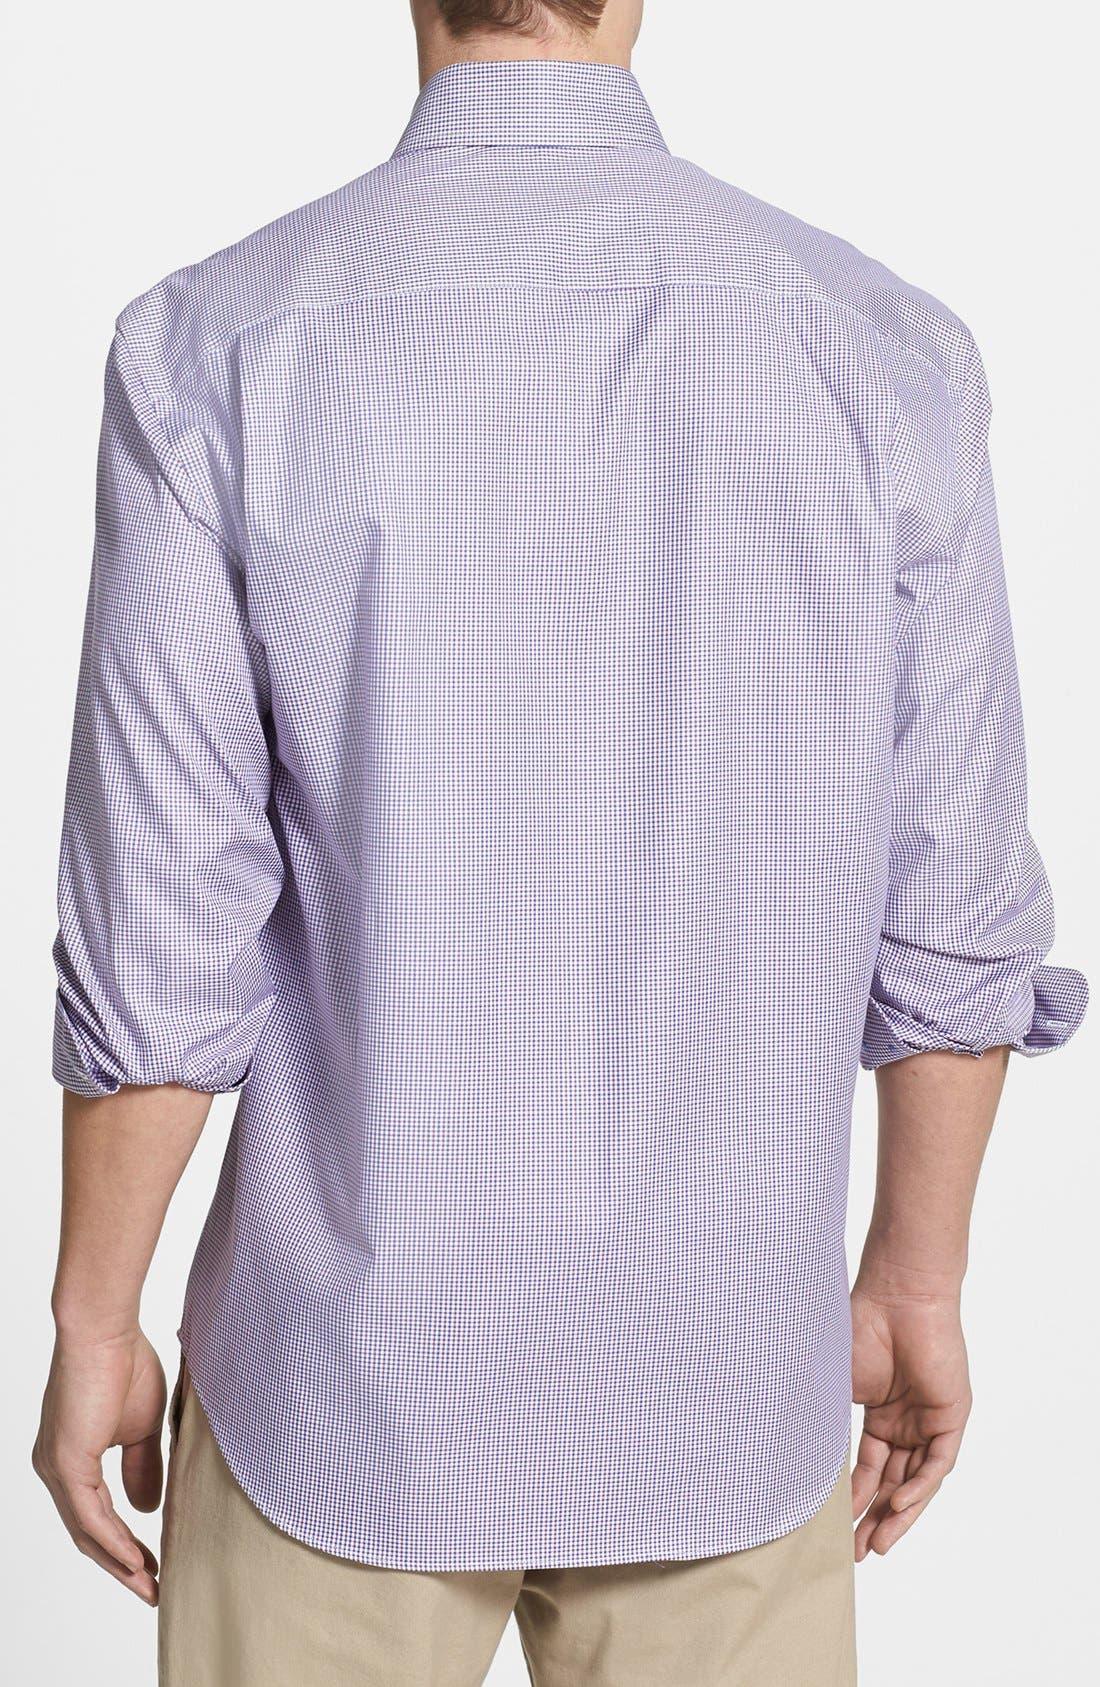 Alternate Image 2  - Robert Talbott Classic Fit Sport Shirt